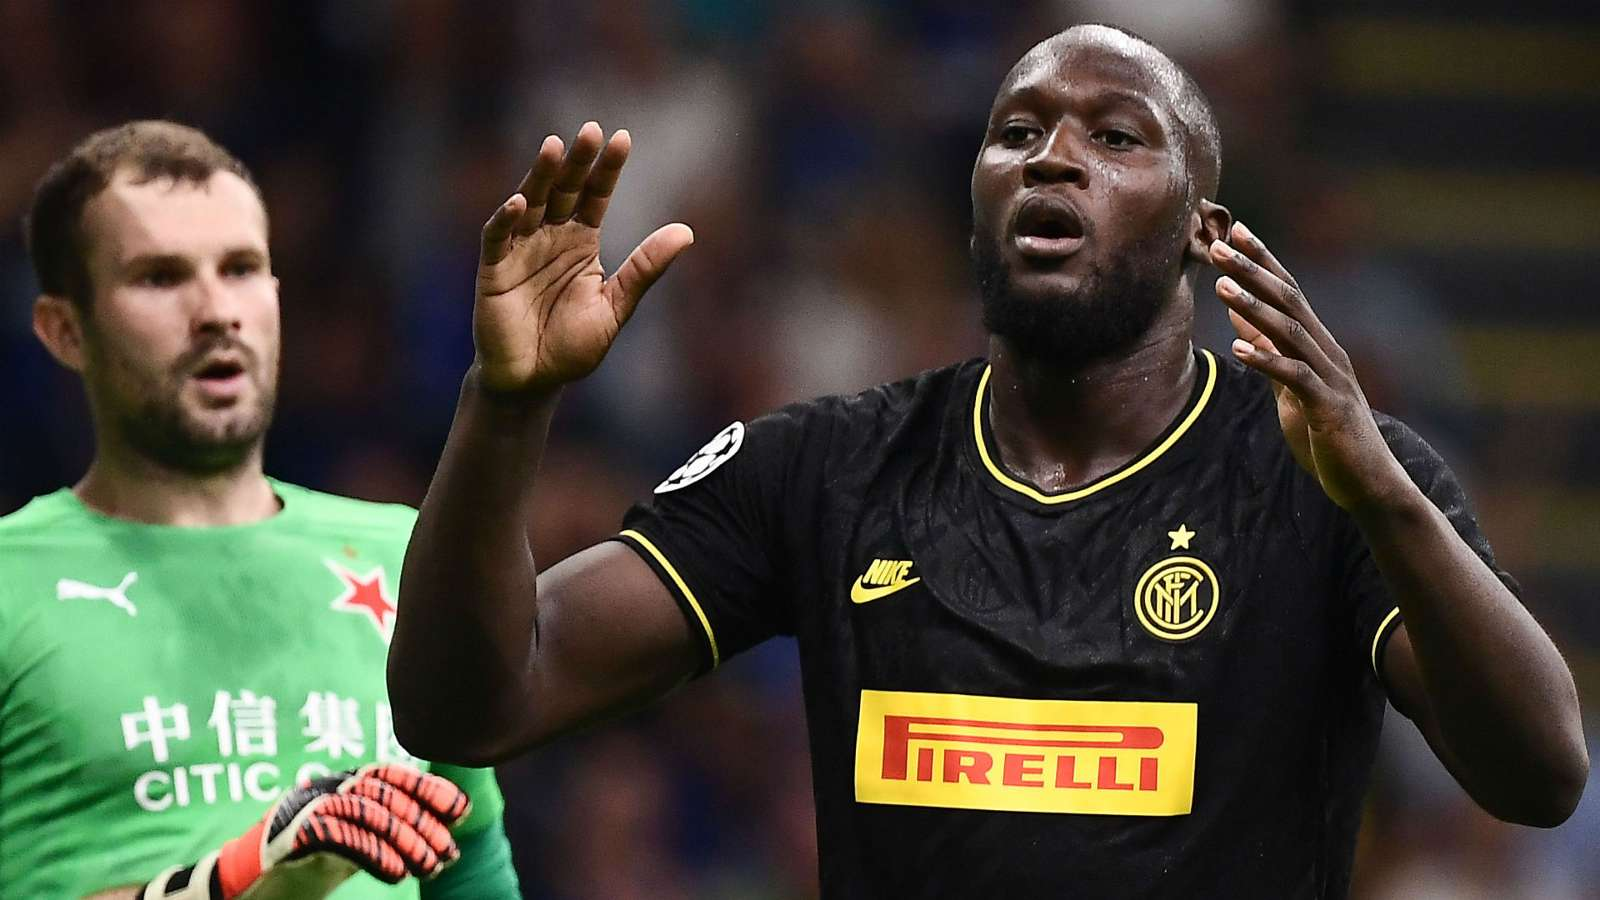 اینتر-سری آ-لیگ قهرمانان اروپا-اسلاویا پراگ-آنتونیو کونته-Inter